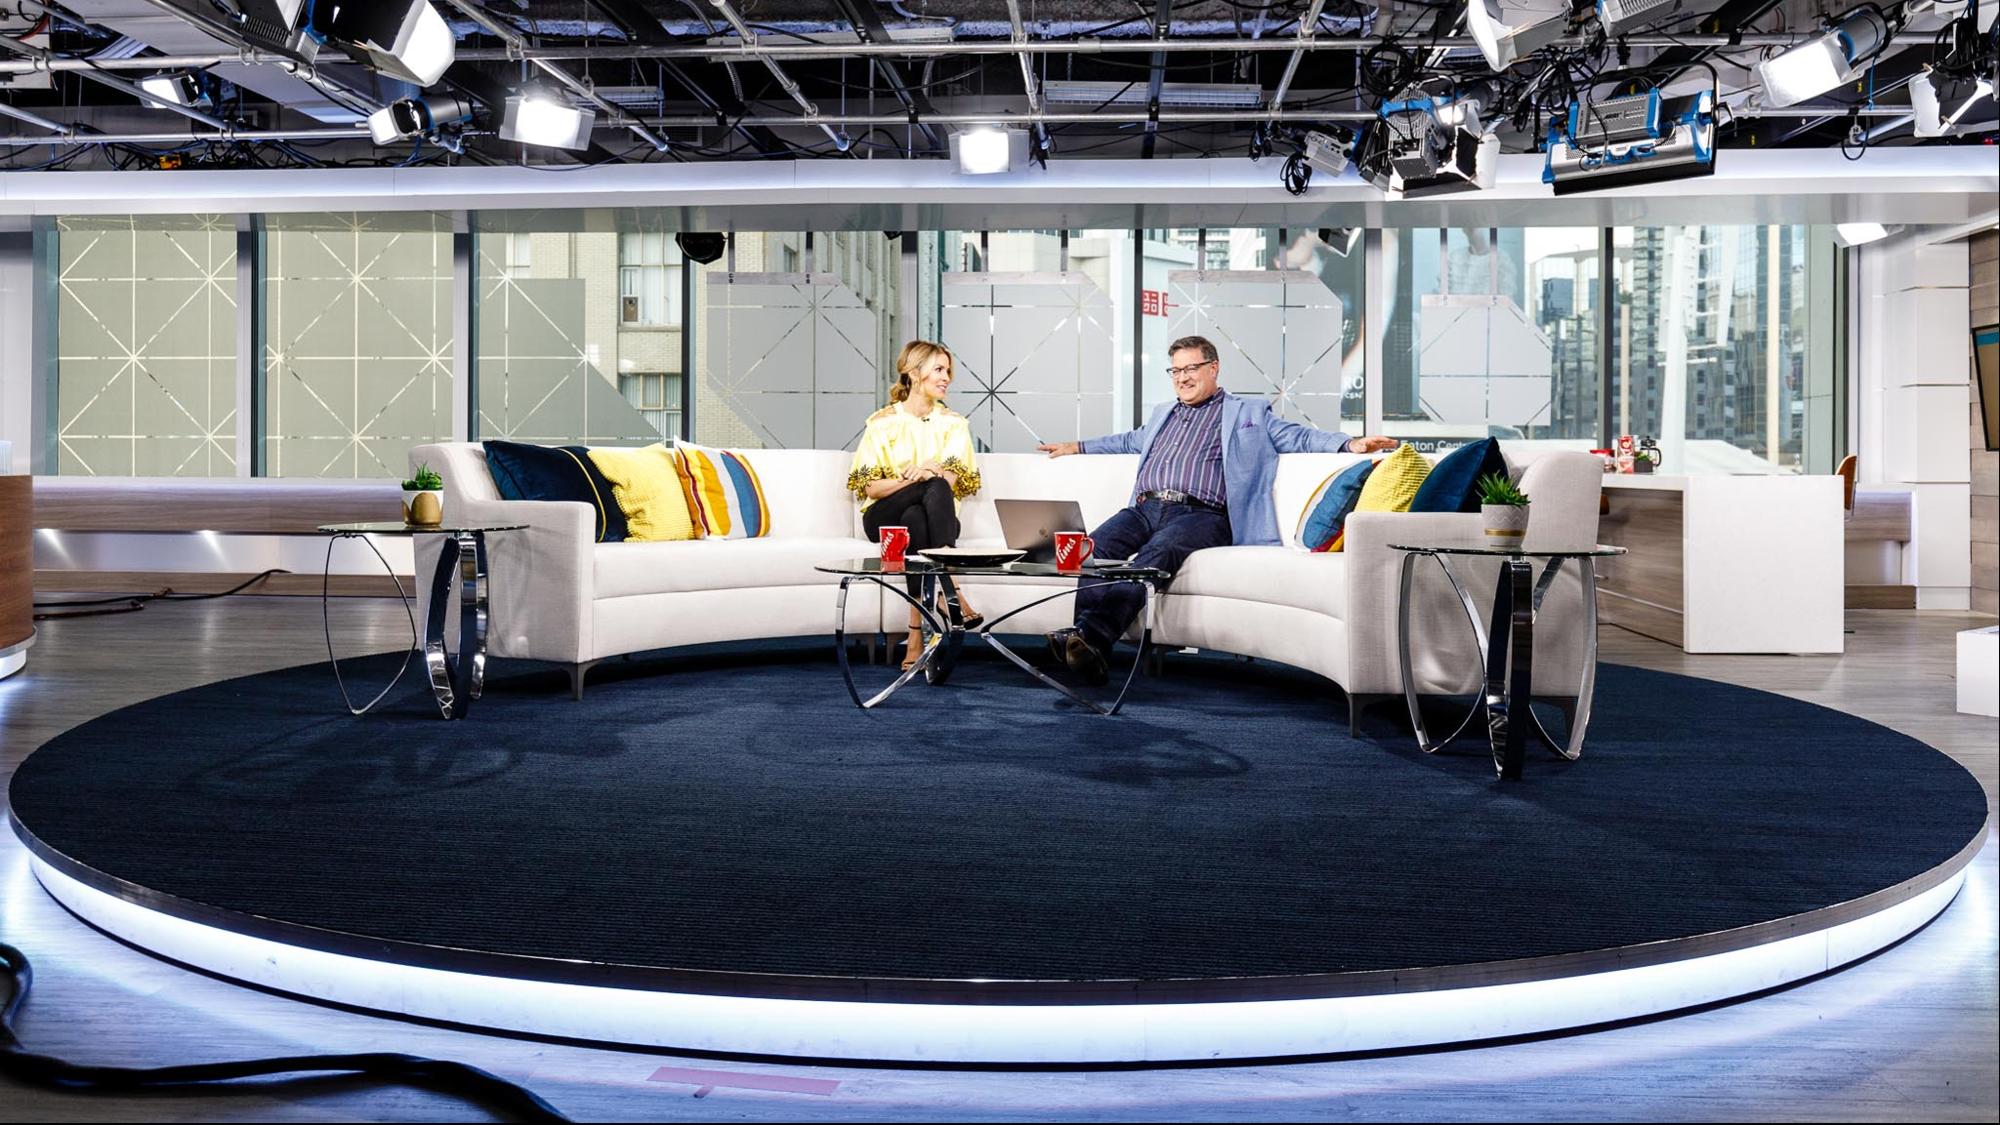 ncs_bt-breakfast-television-canada-tv-studio_0001